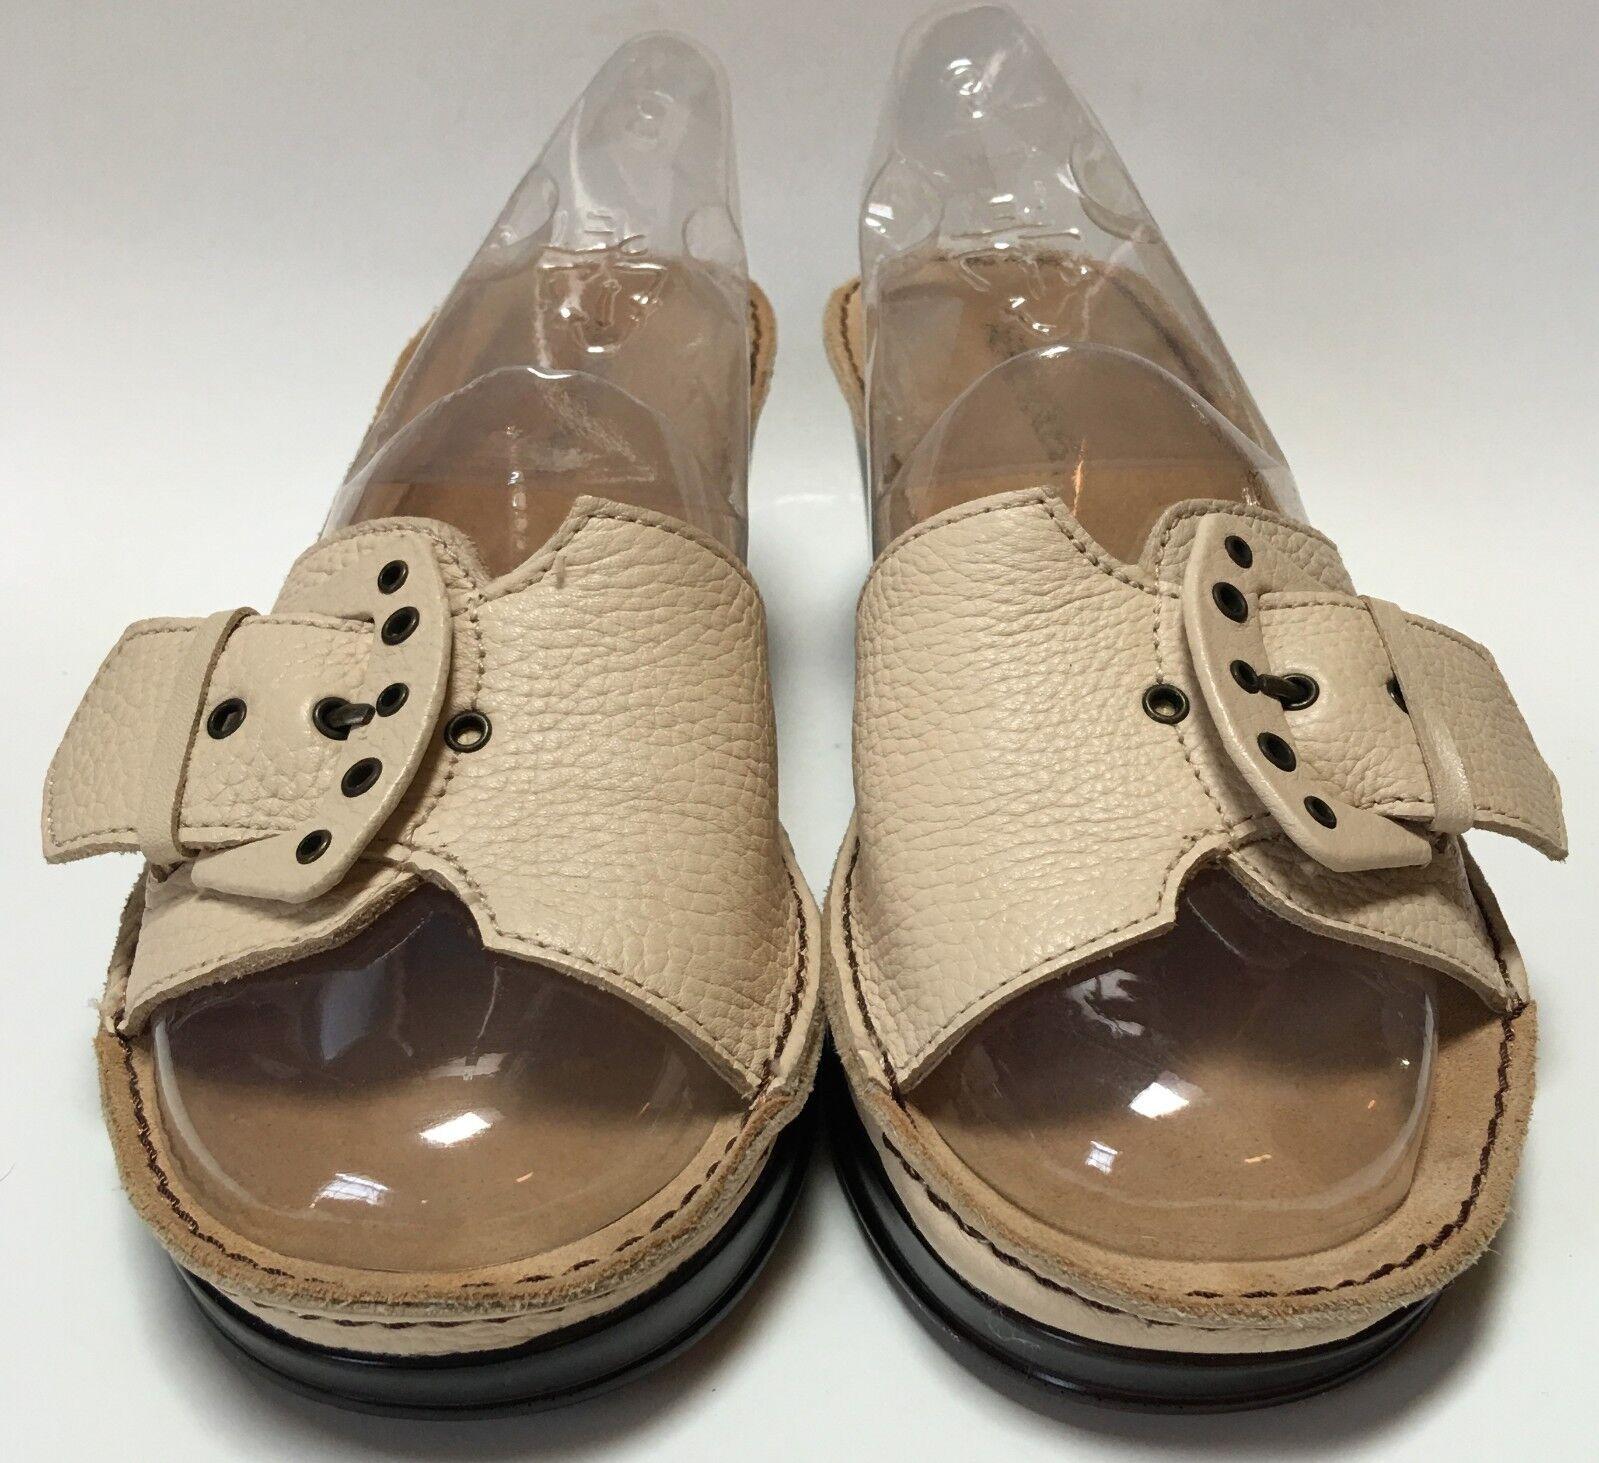 Aerosoles DREAD STOCK Beige Buckle Sandal Front Slides Wedge Heel Sandal Buckle Size 9 ½ M 2b5285